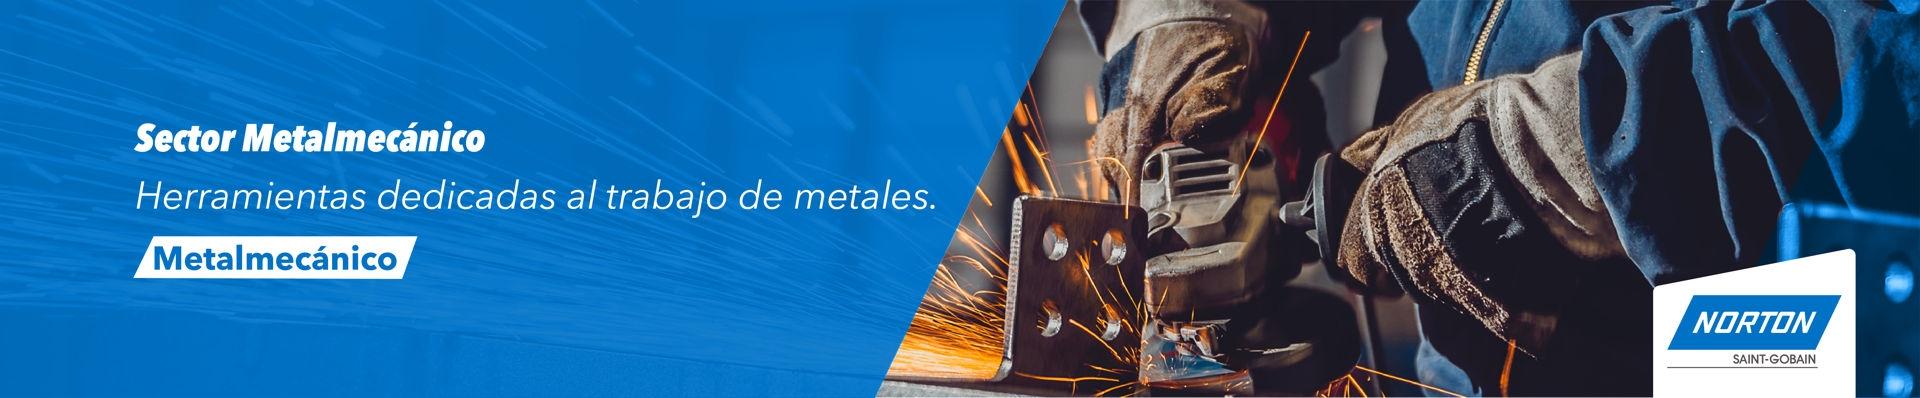 Metalmecánico